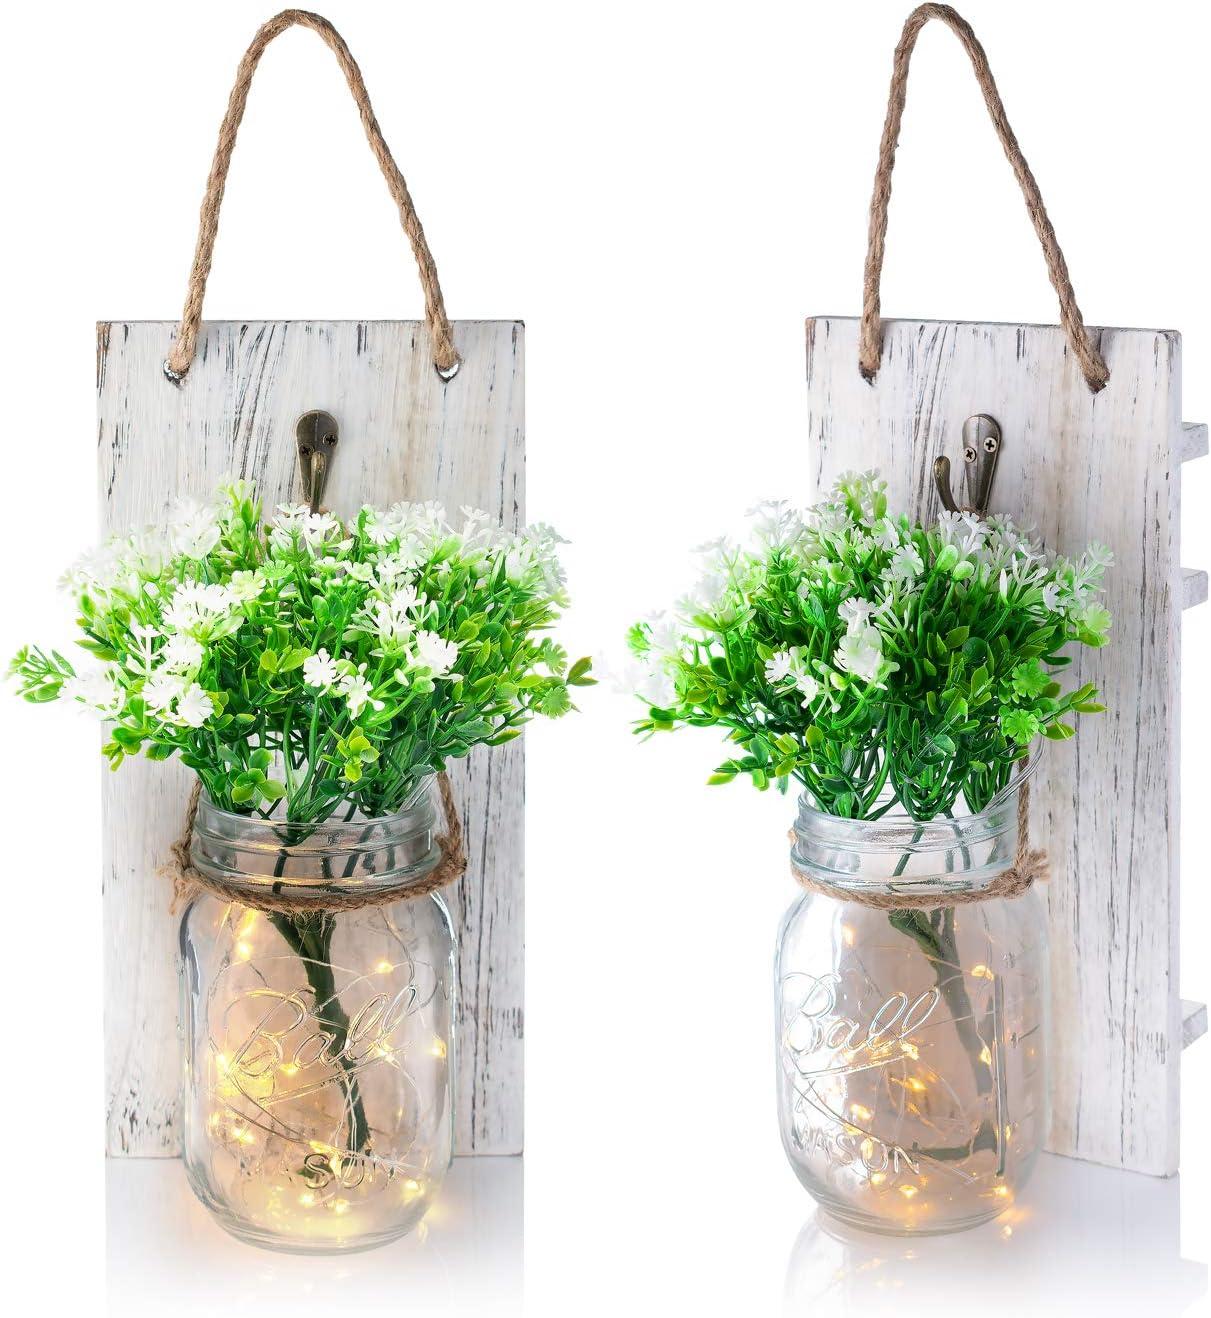 Hanging Mail order Ultra-Cheap Deals Mason Jar Wall House Farmhouse Decor Decoratio